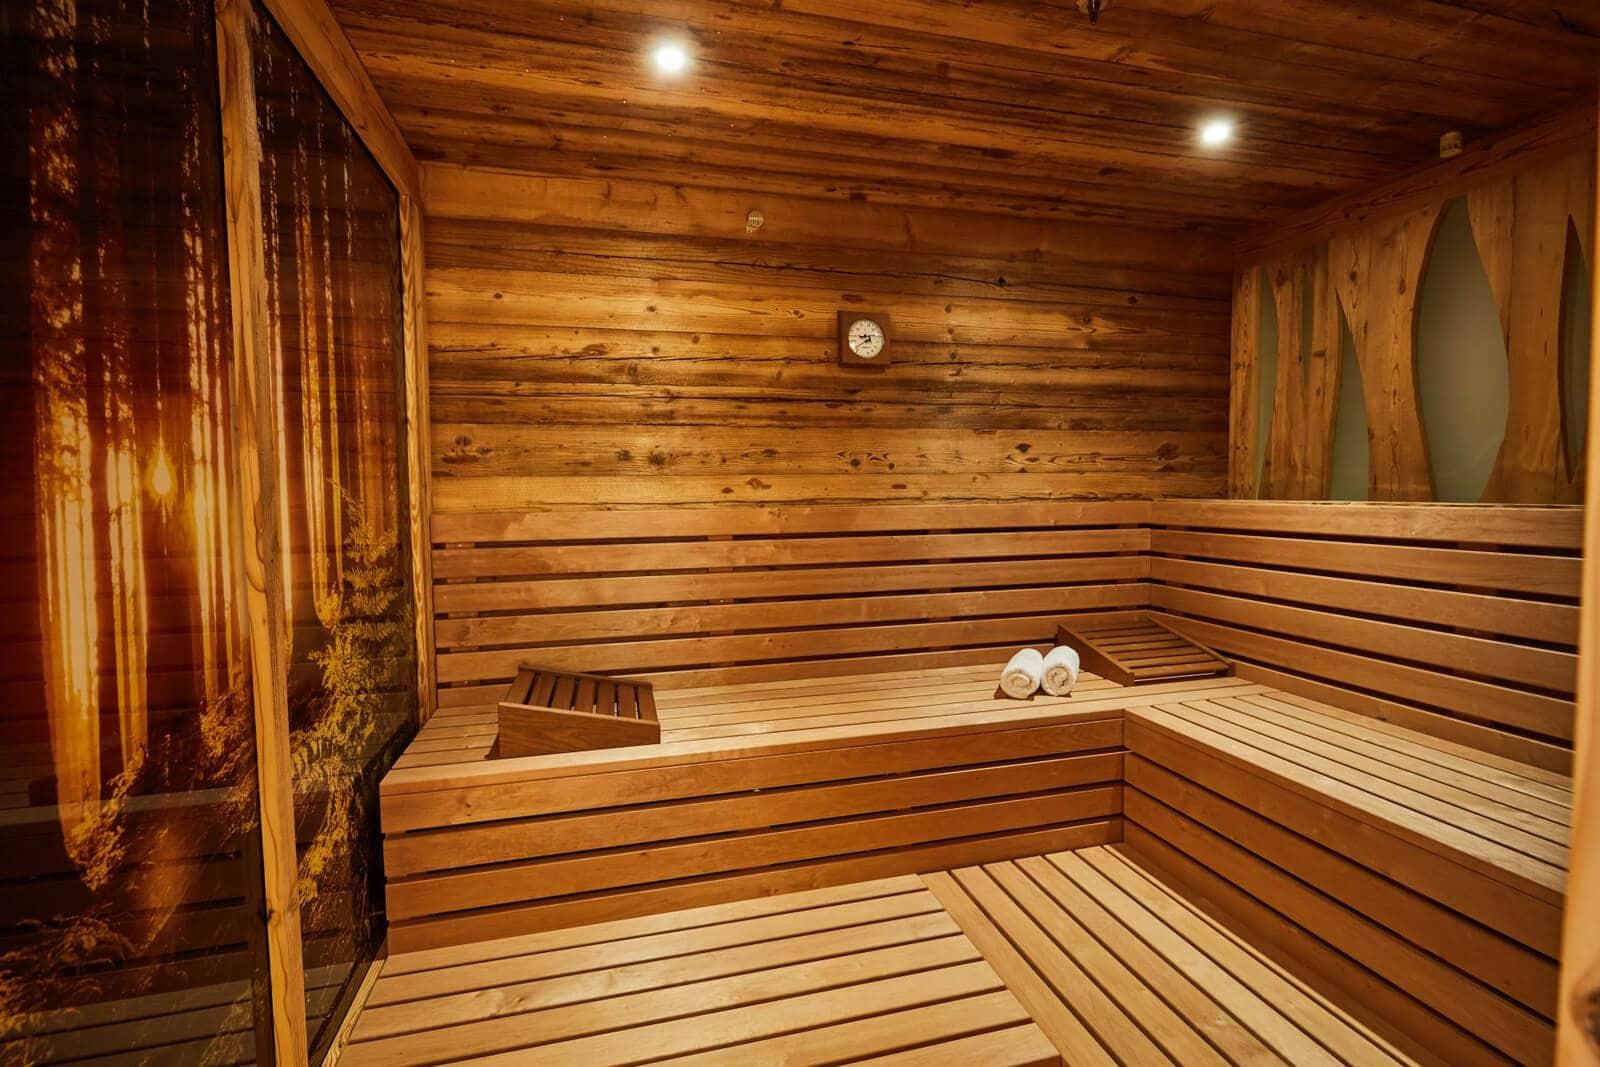 MS Europa 2 - sauna